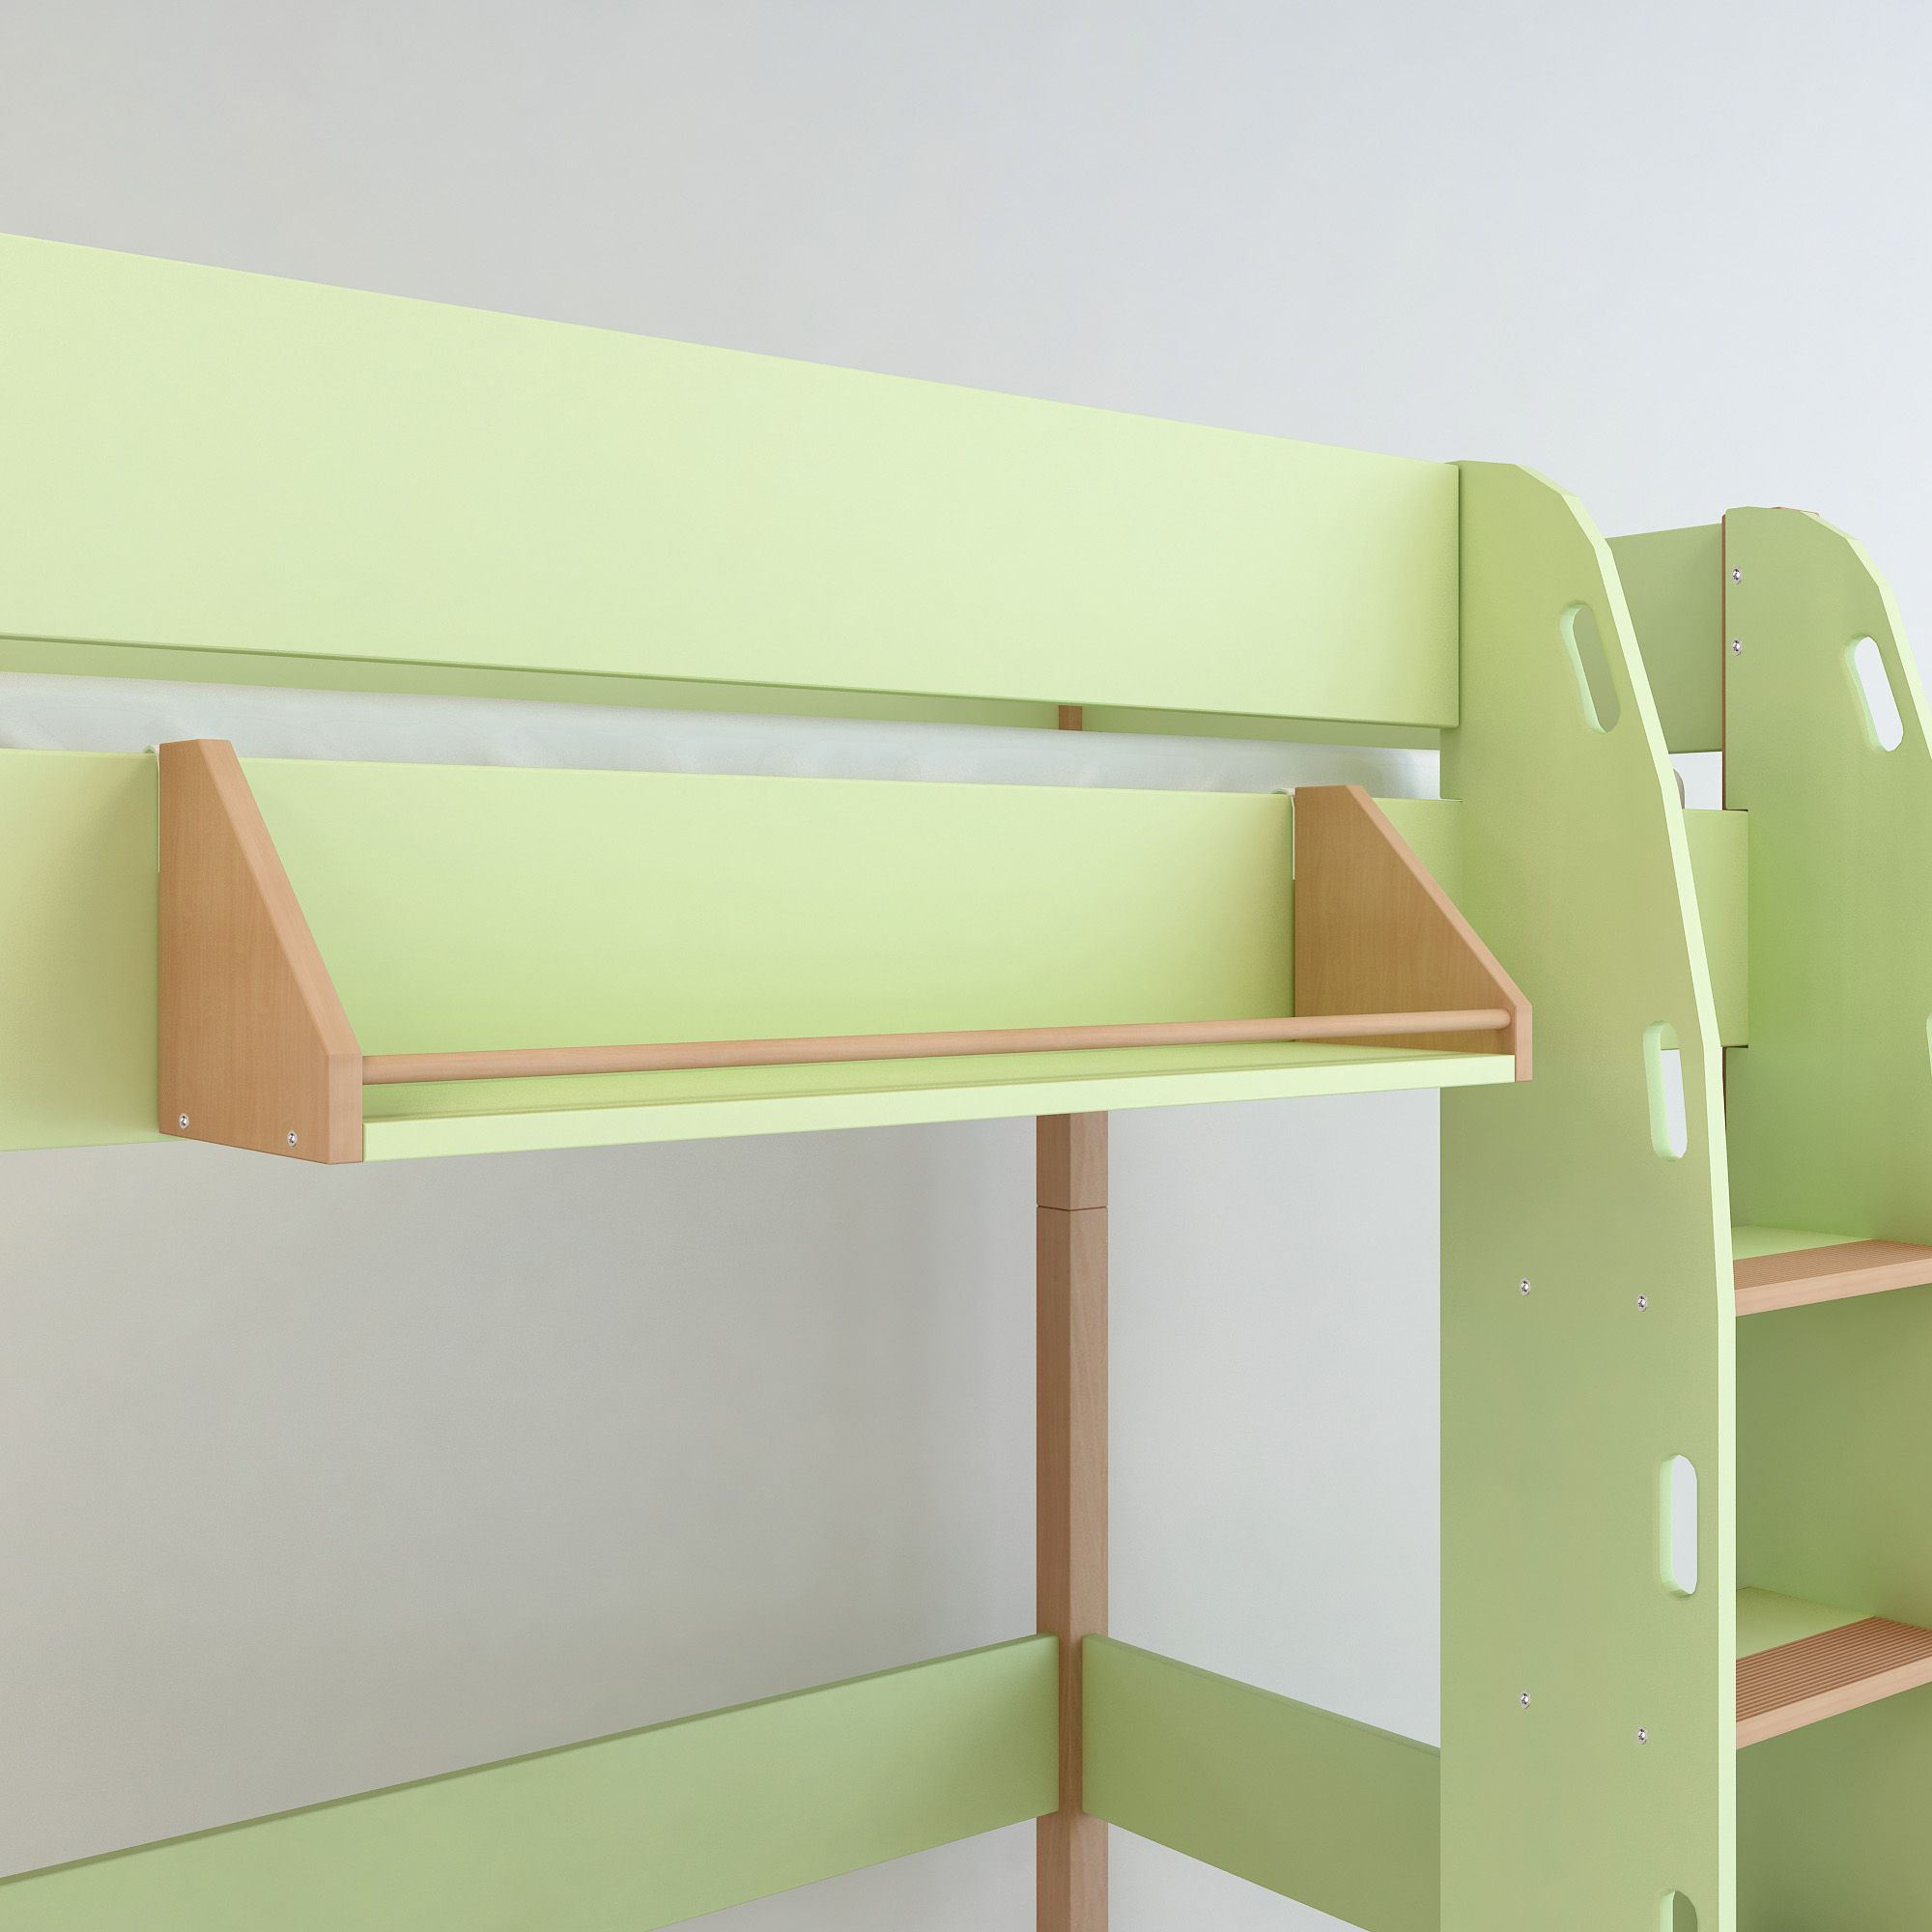 Einhängeregal Bett Ablageregal Regal Hochbett Etagenbett Bettzubehör Buche grün